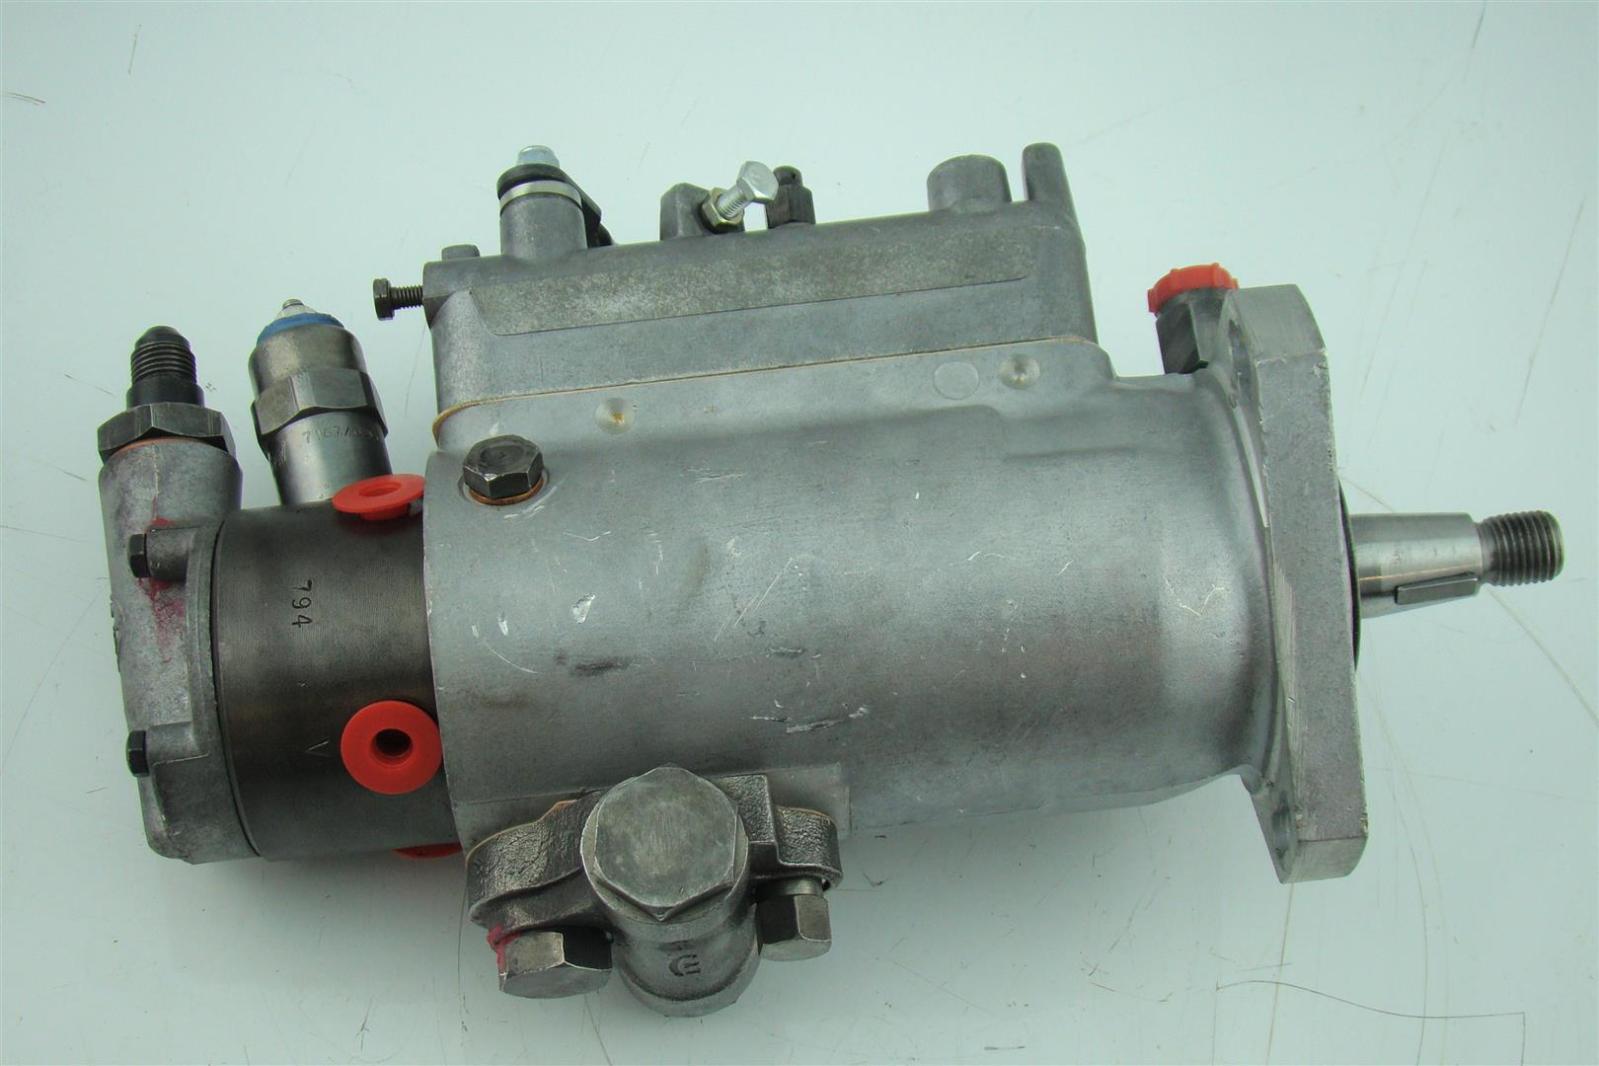 John Deere Injection Pump Parts : John deere fuel injection pump reman se ebay